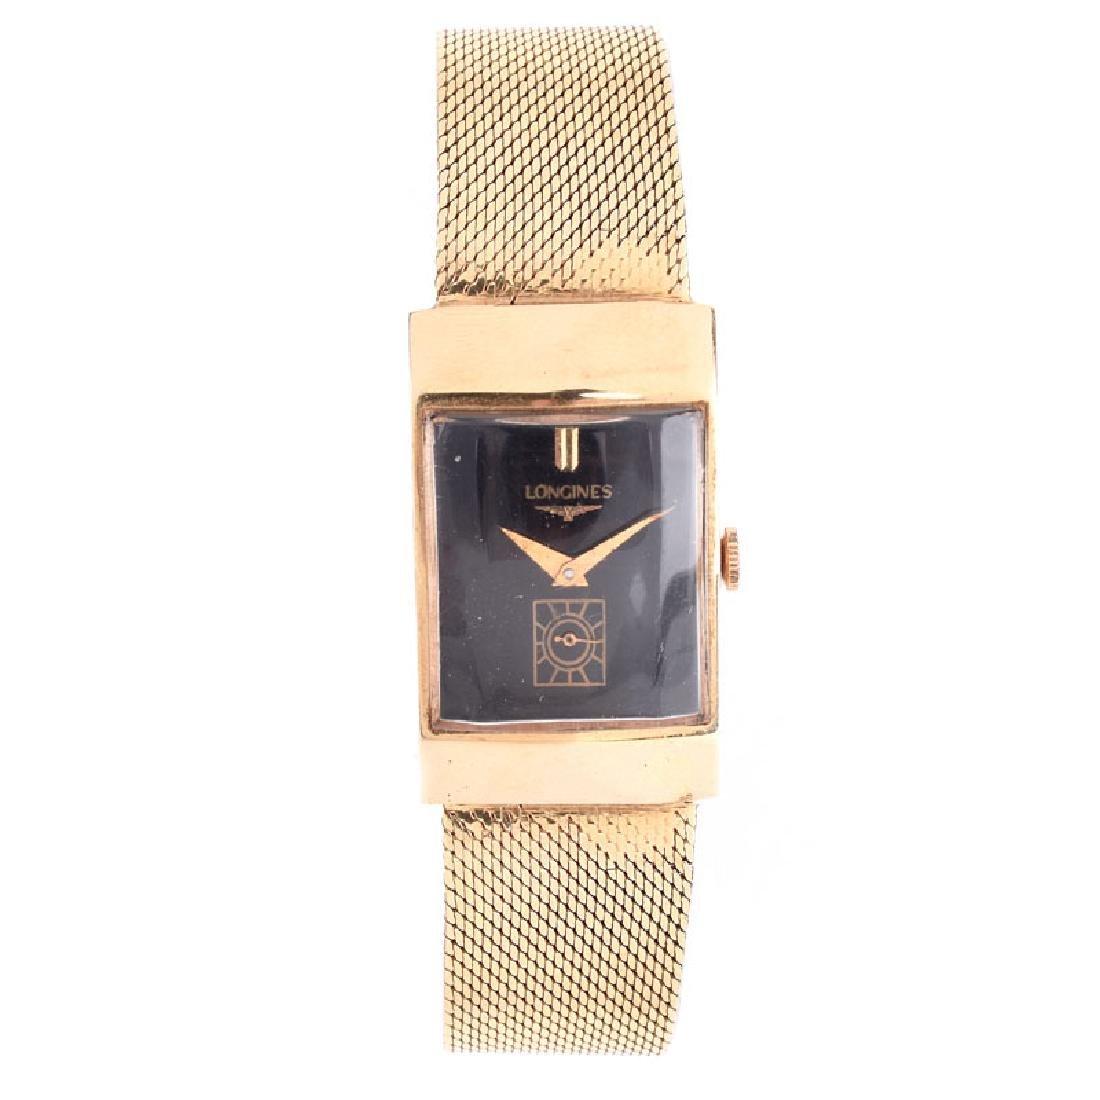 Man's Vintage Longines 14 Karat Yellow Gold Watch with